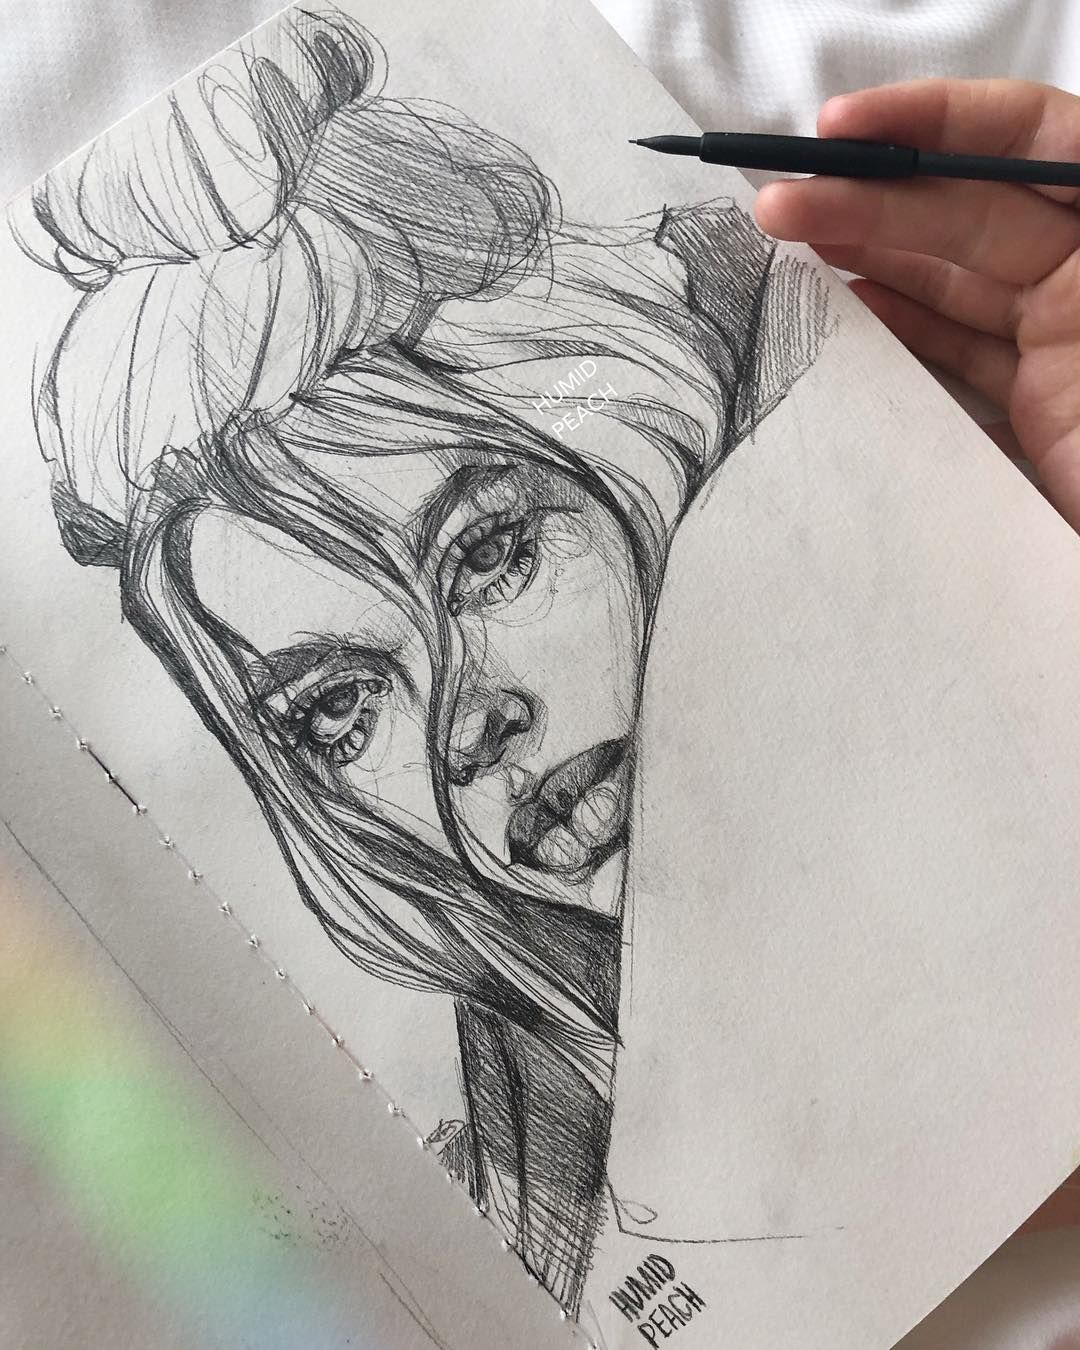 Идеи для рисунок карандашом